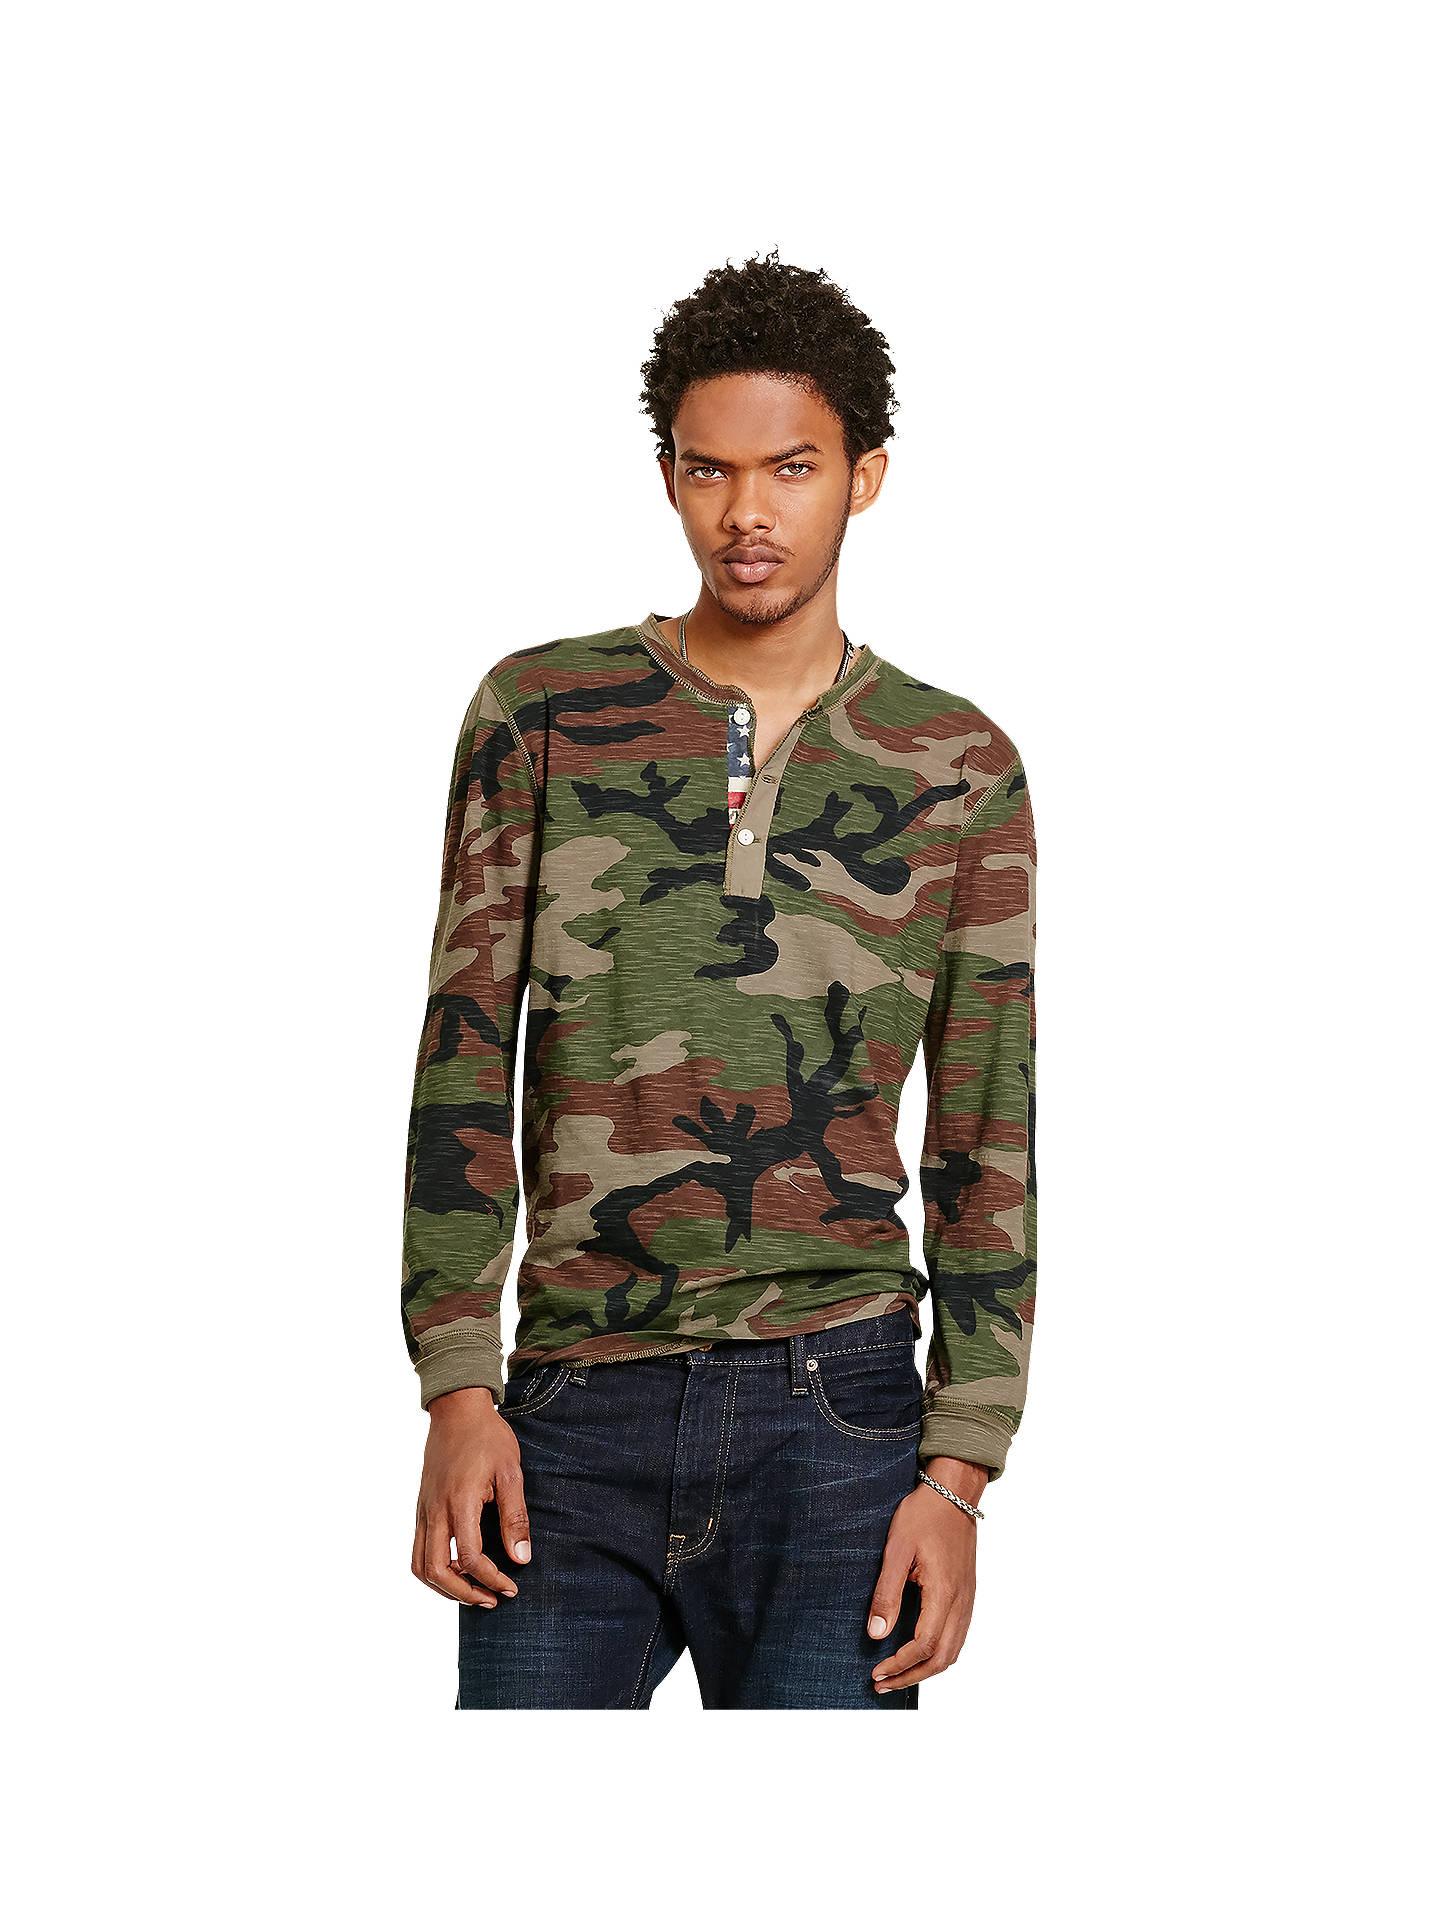 bb7338dffc7d5 Buy Denim & Supply Ralph Lauren Henley Long Sleeve T-Shirt, Sabrage Multi,  ...